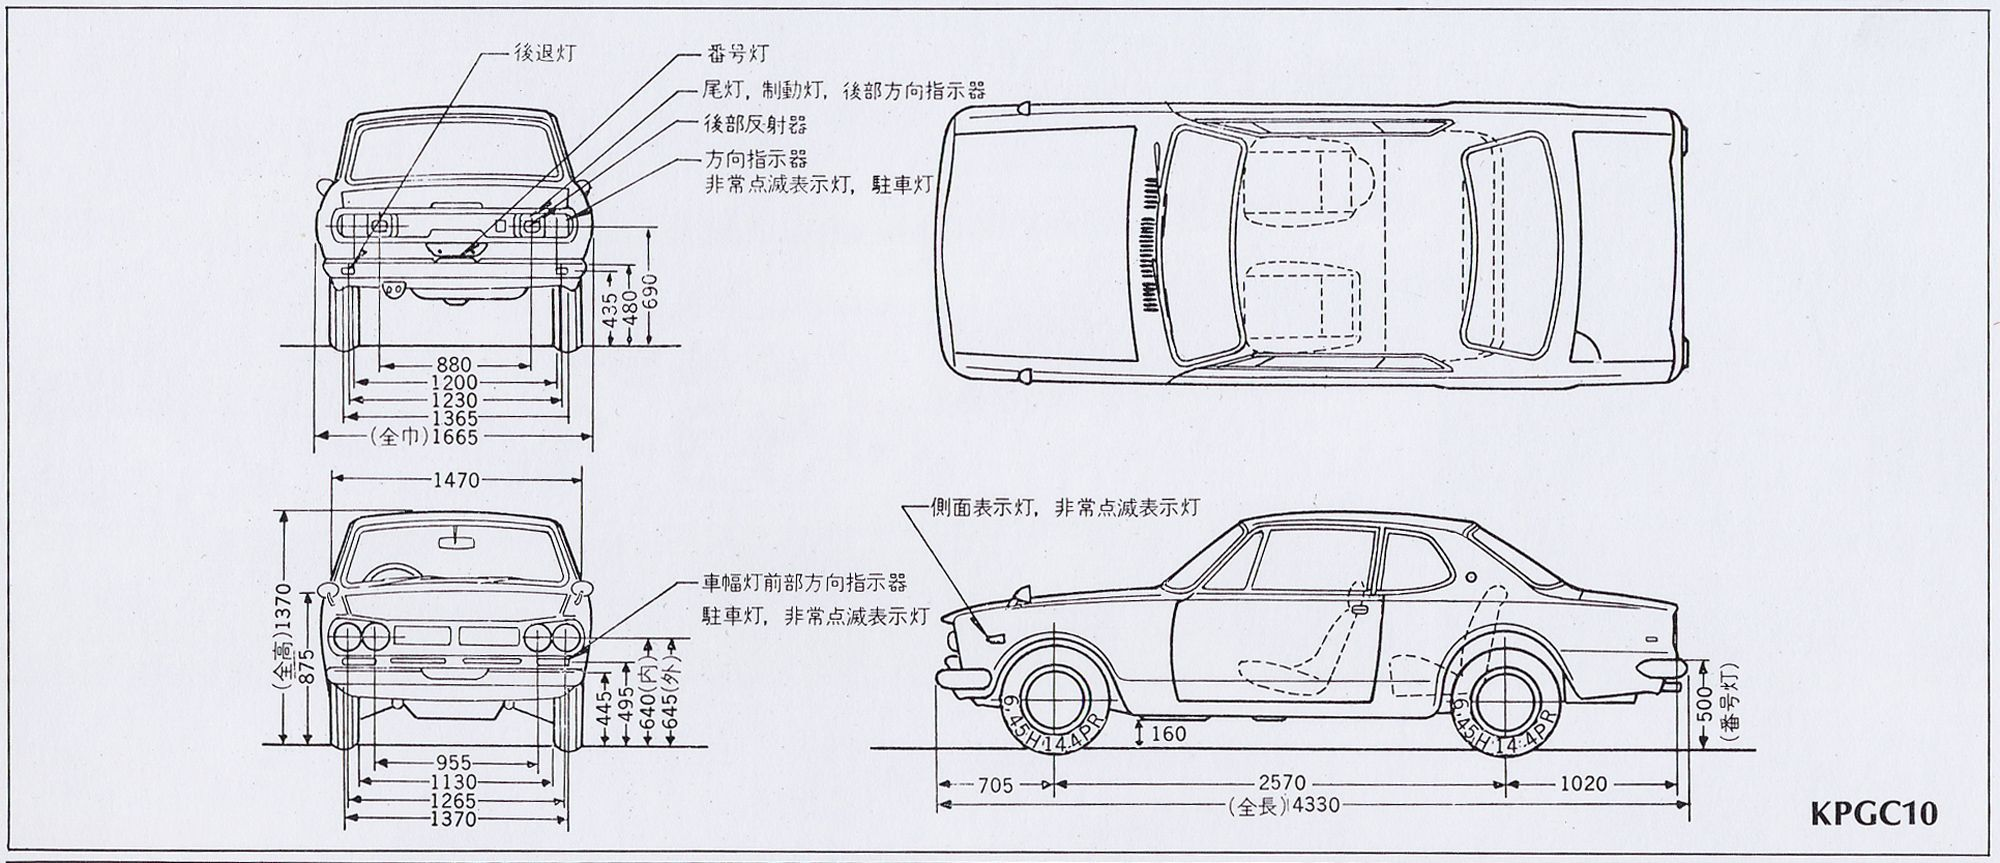 medium resolution of dimension kpgc hakosuka nissan skyline 2000 skyline gtr jdm cars automobile